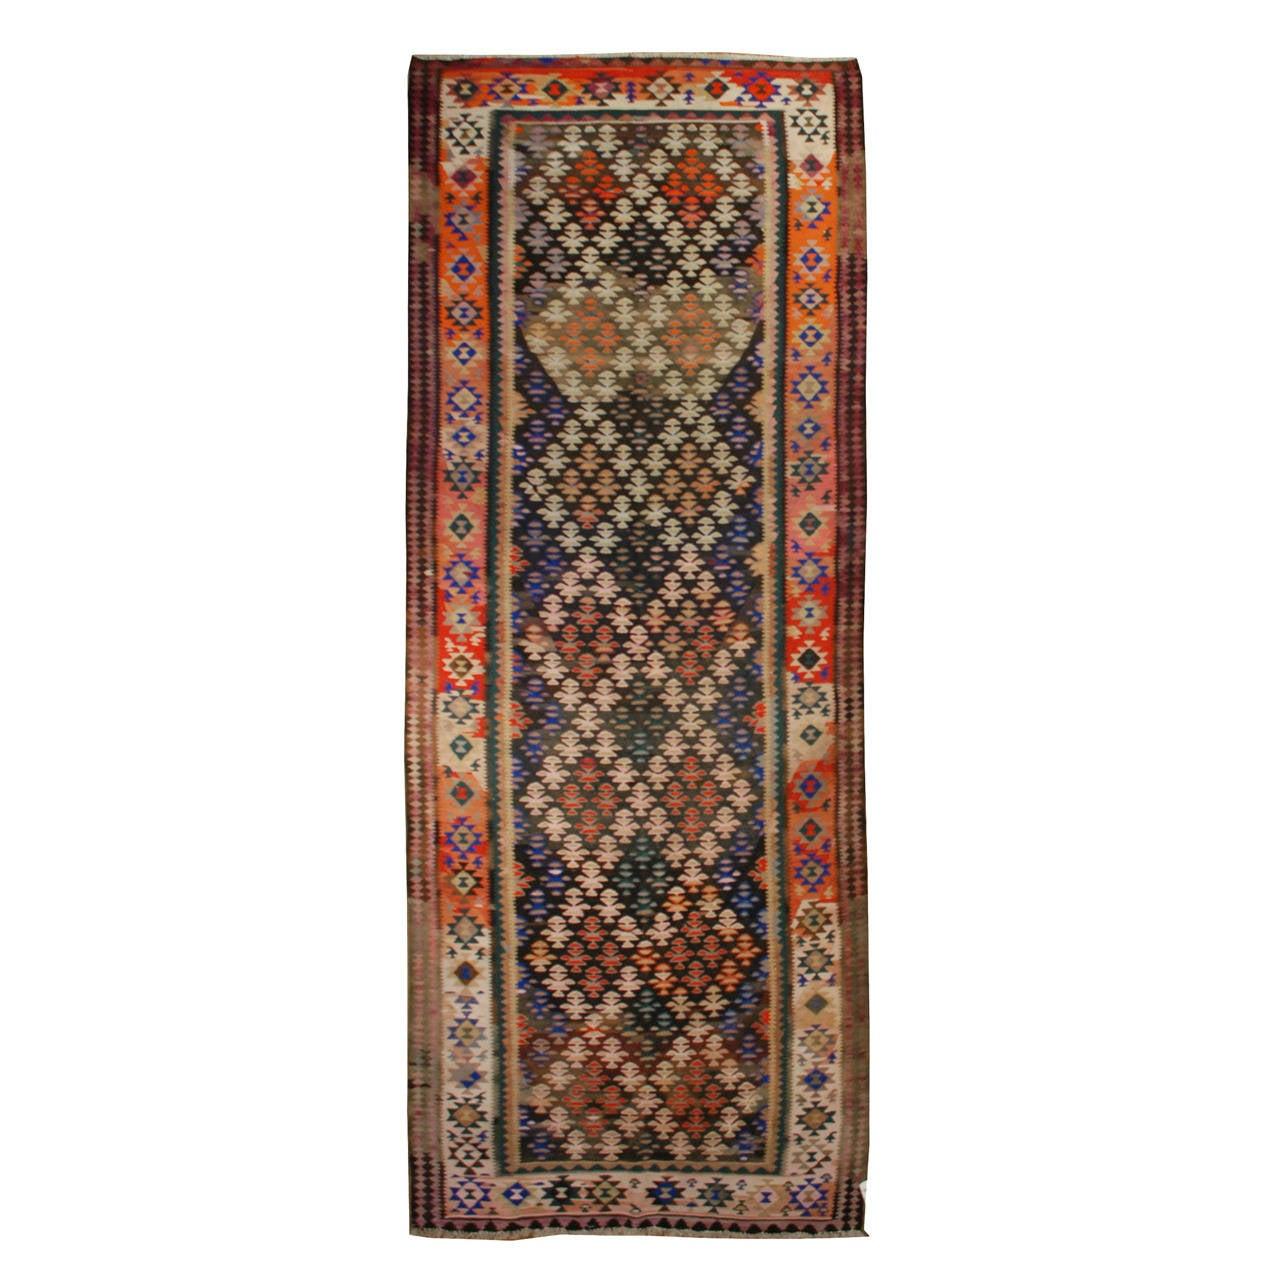 early 20th century veramin kilim runner rug at 1stdibs